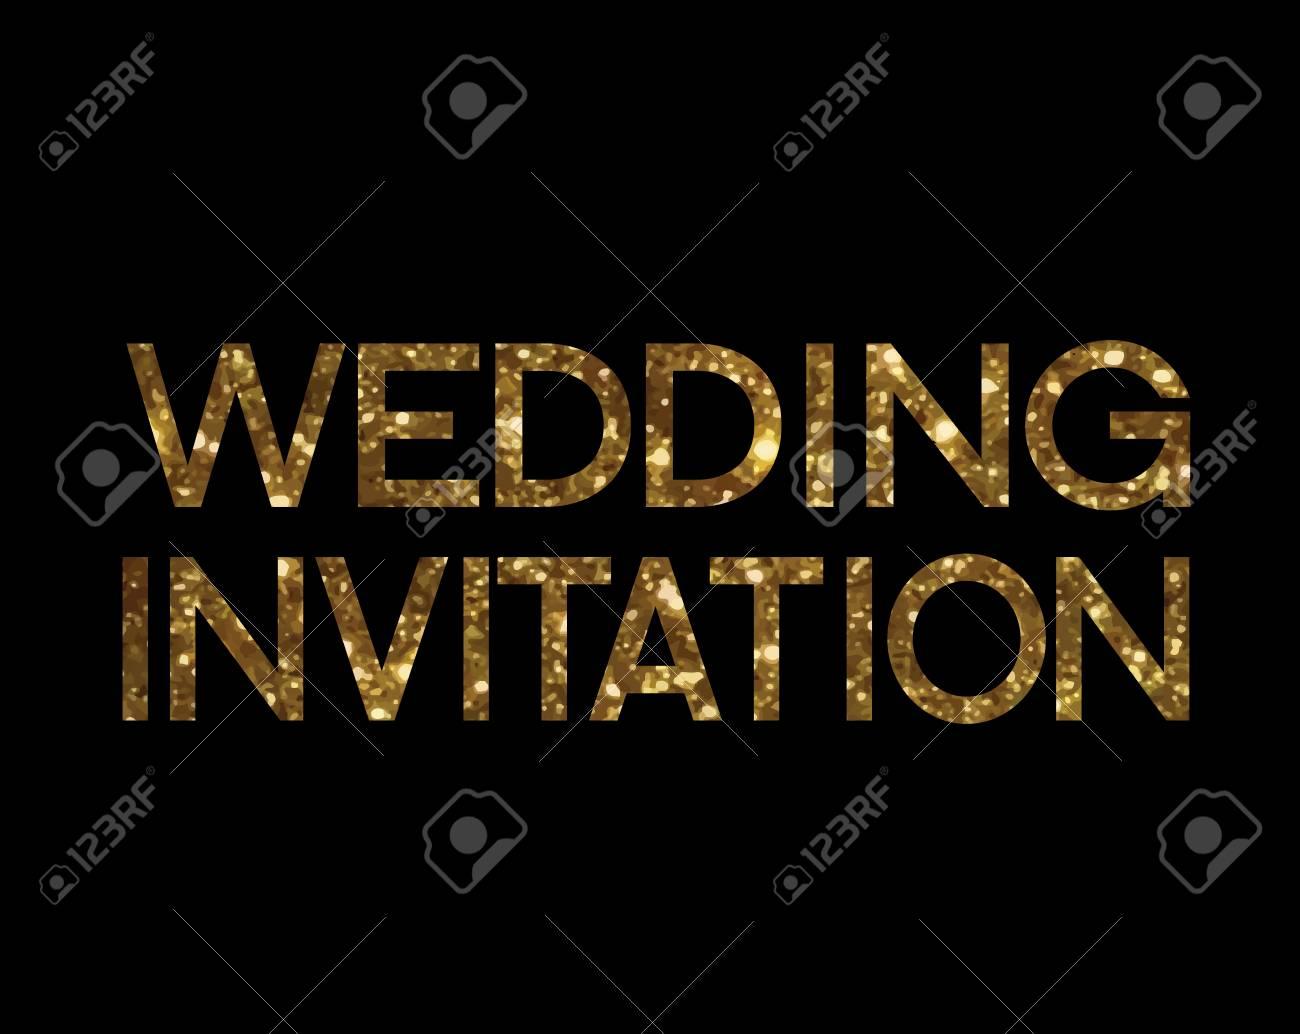 The Golden glitter isolated standard font word WEDDING INVITATION